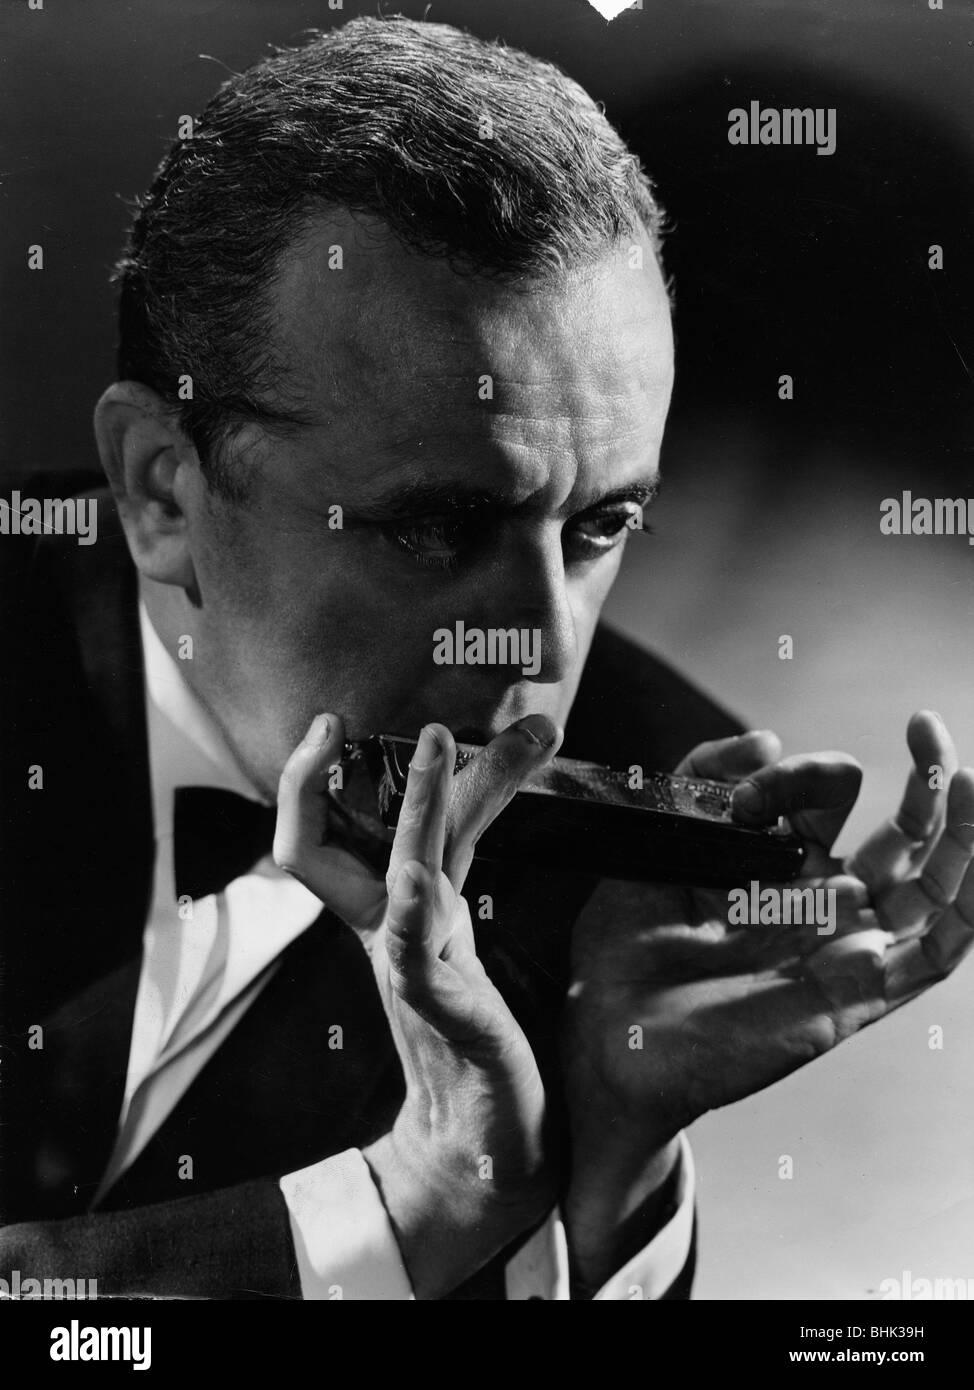 Larry Adler (1914-2001), Musician, playing his harmonica, c1940s. - Stock Image